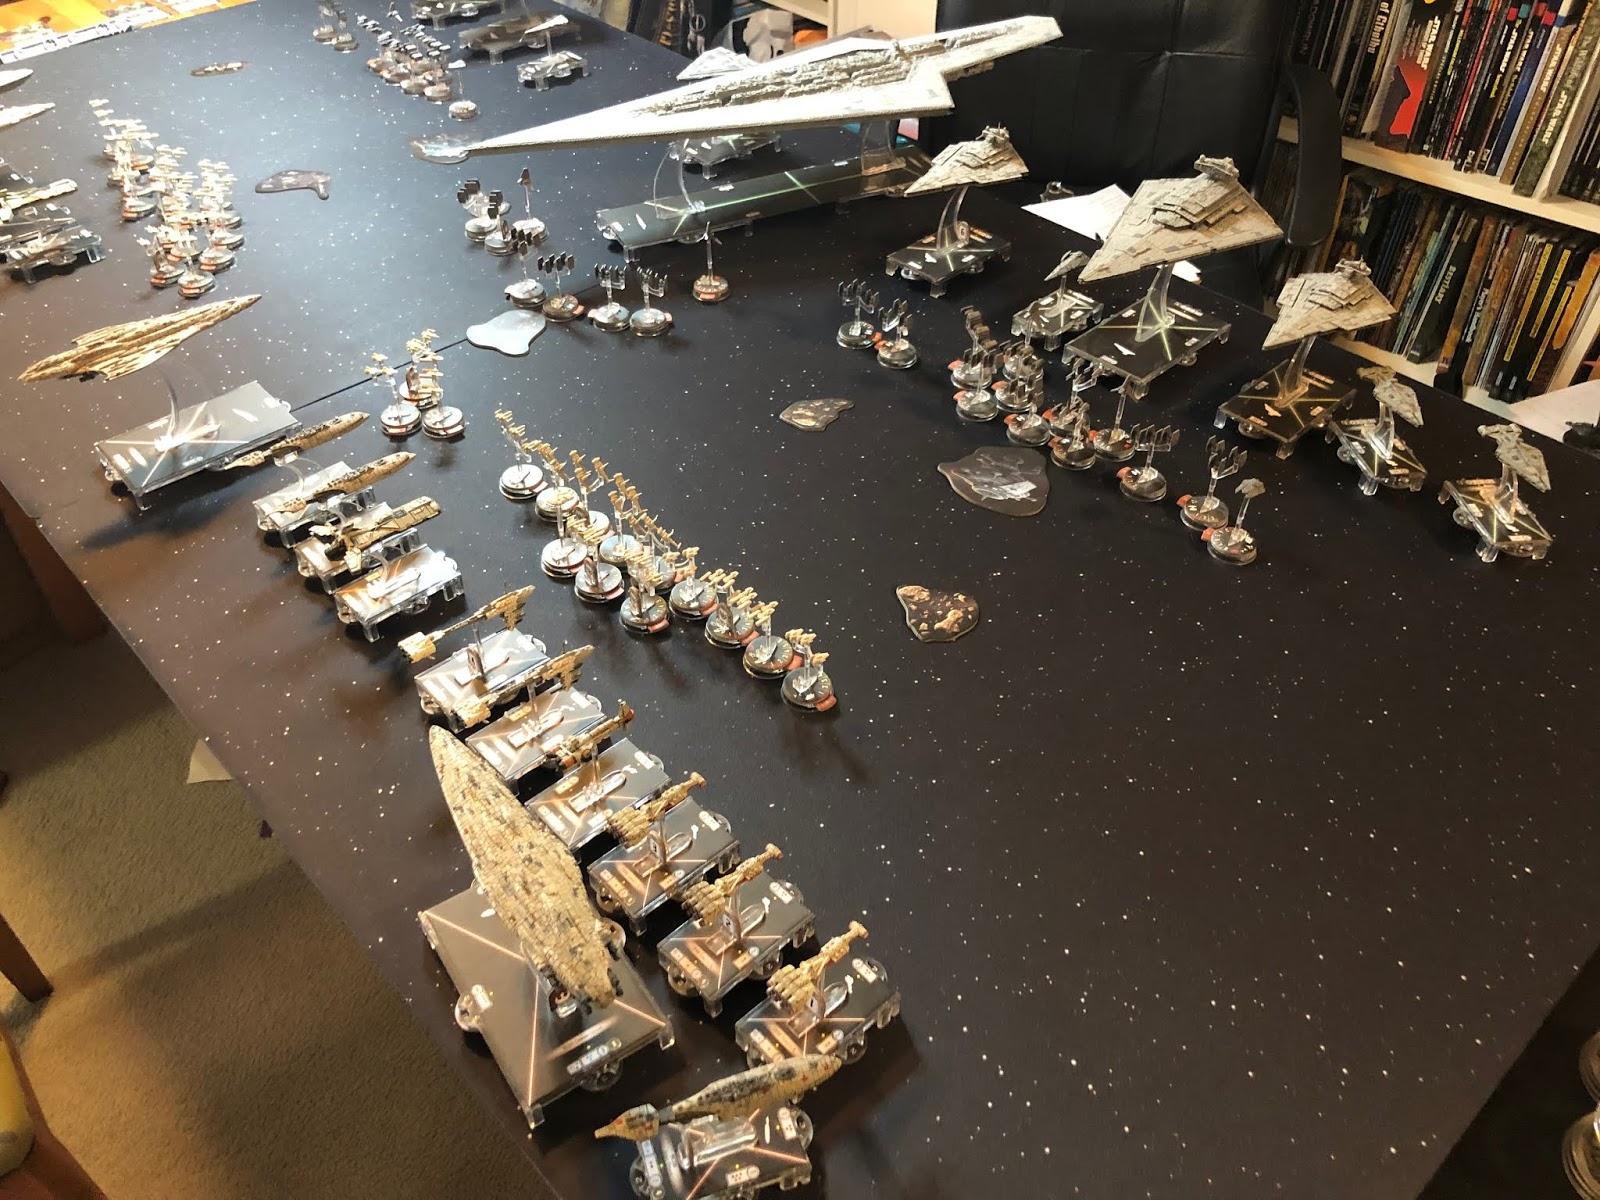 Tierfon Campaign Armada Fleet Battle Part 3